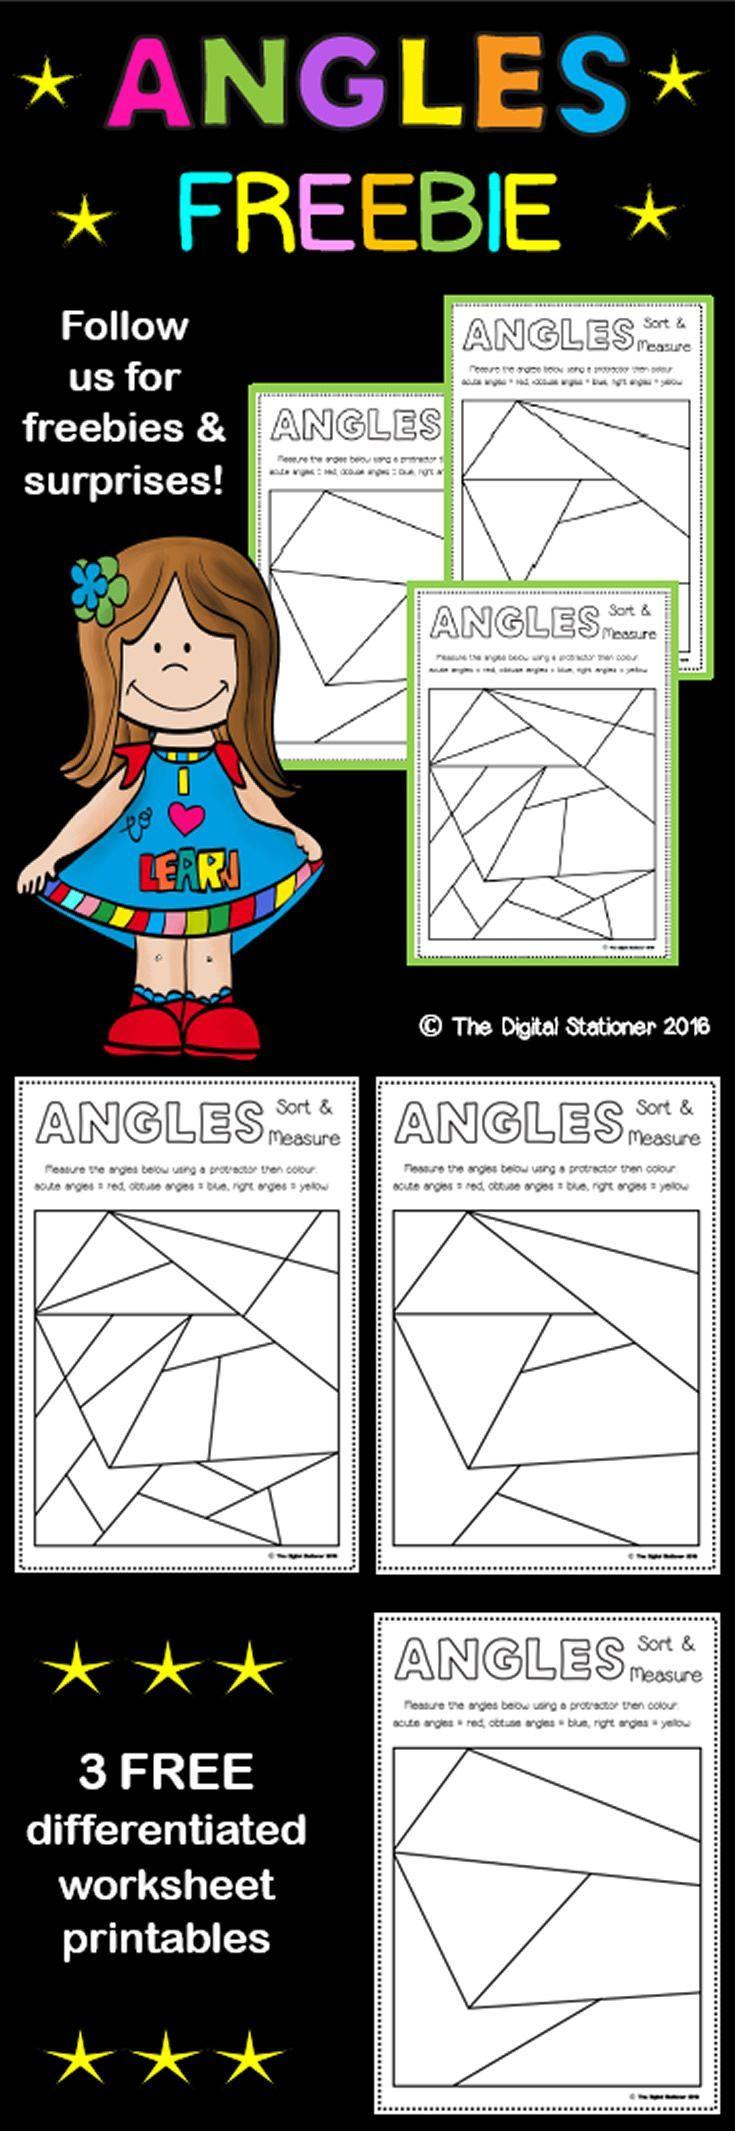 angles freebie sort and measure school math classroom geometry worksheets ks2 maths. Black Bedroom Furniture Sets. Home Design Ideas